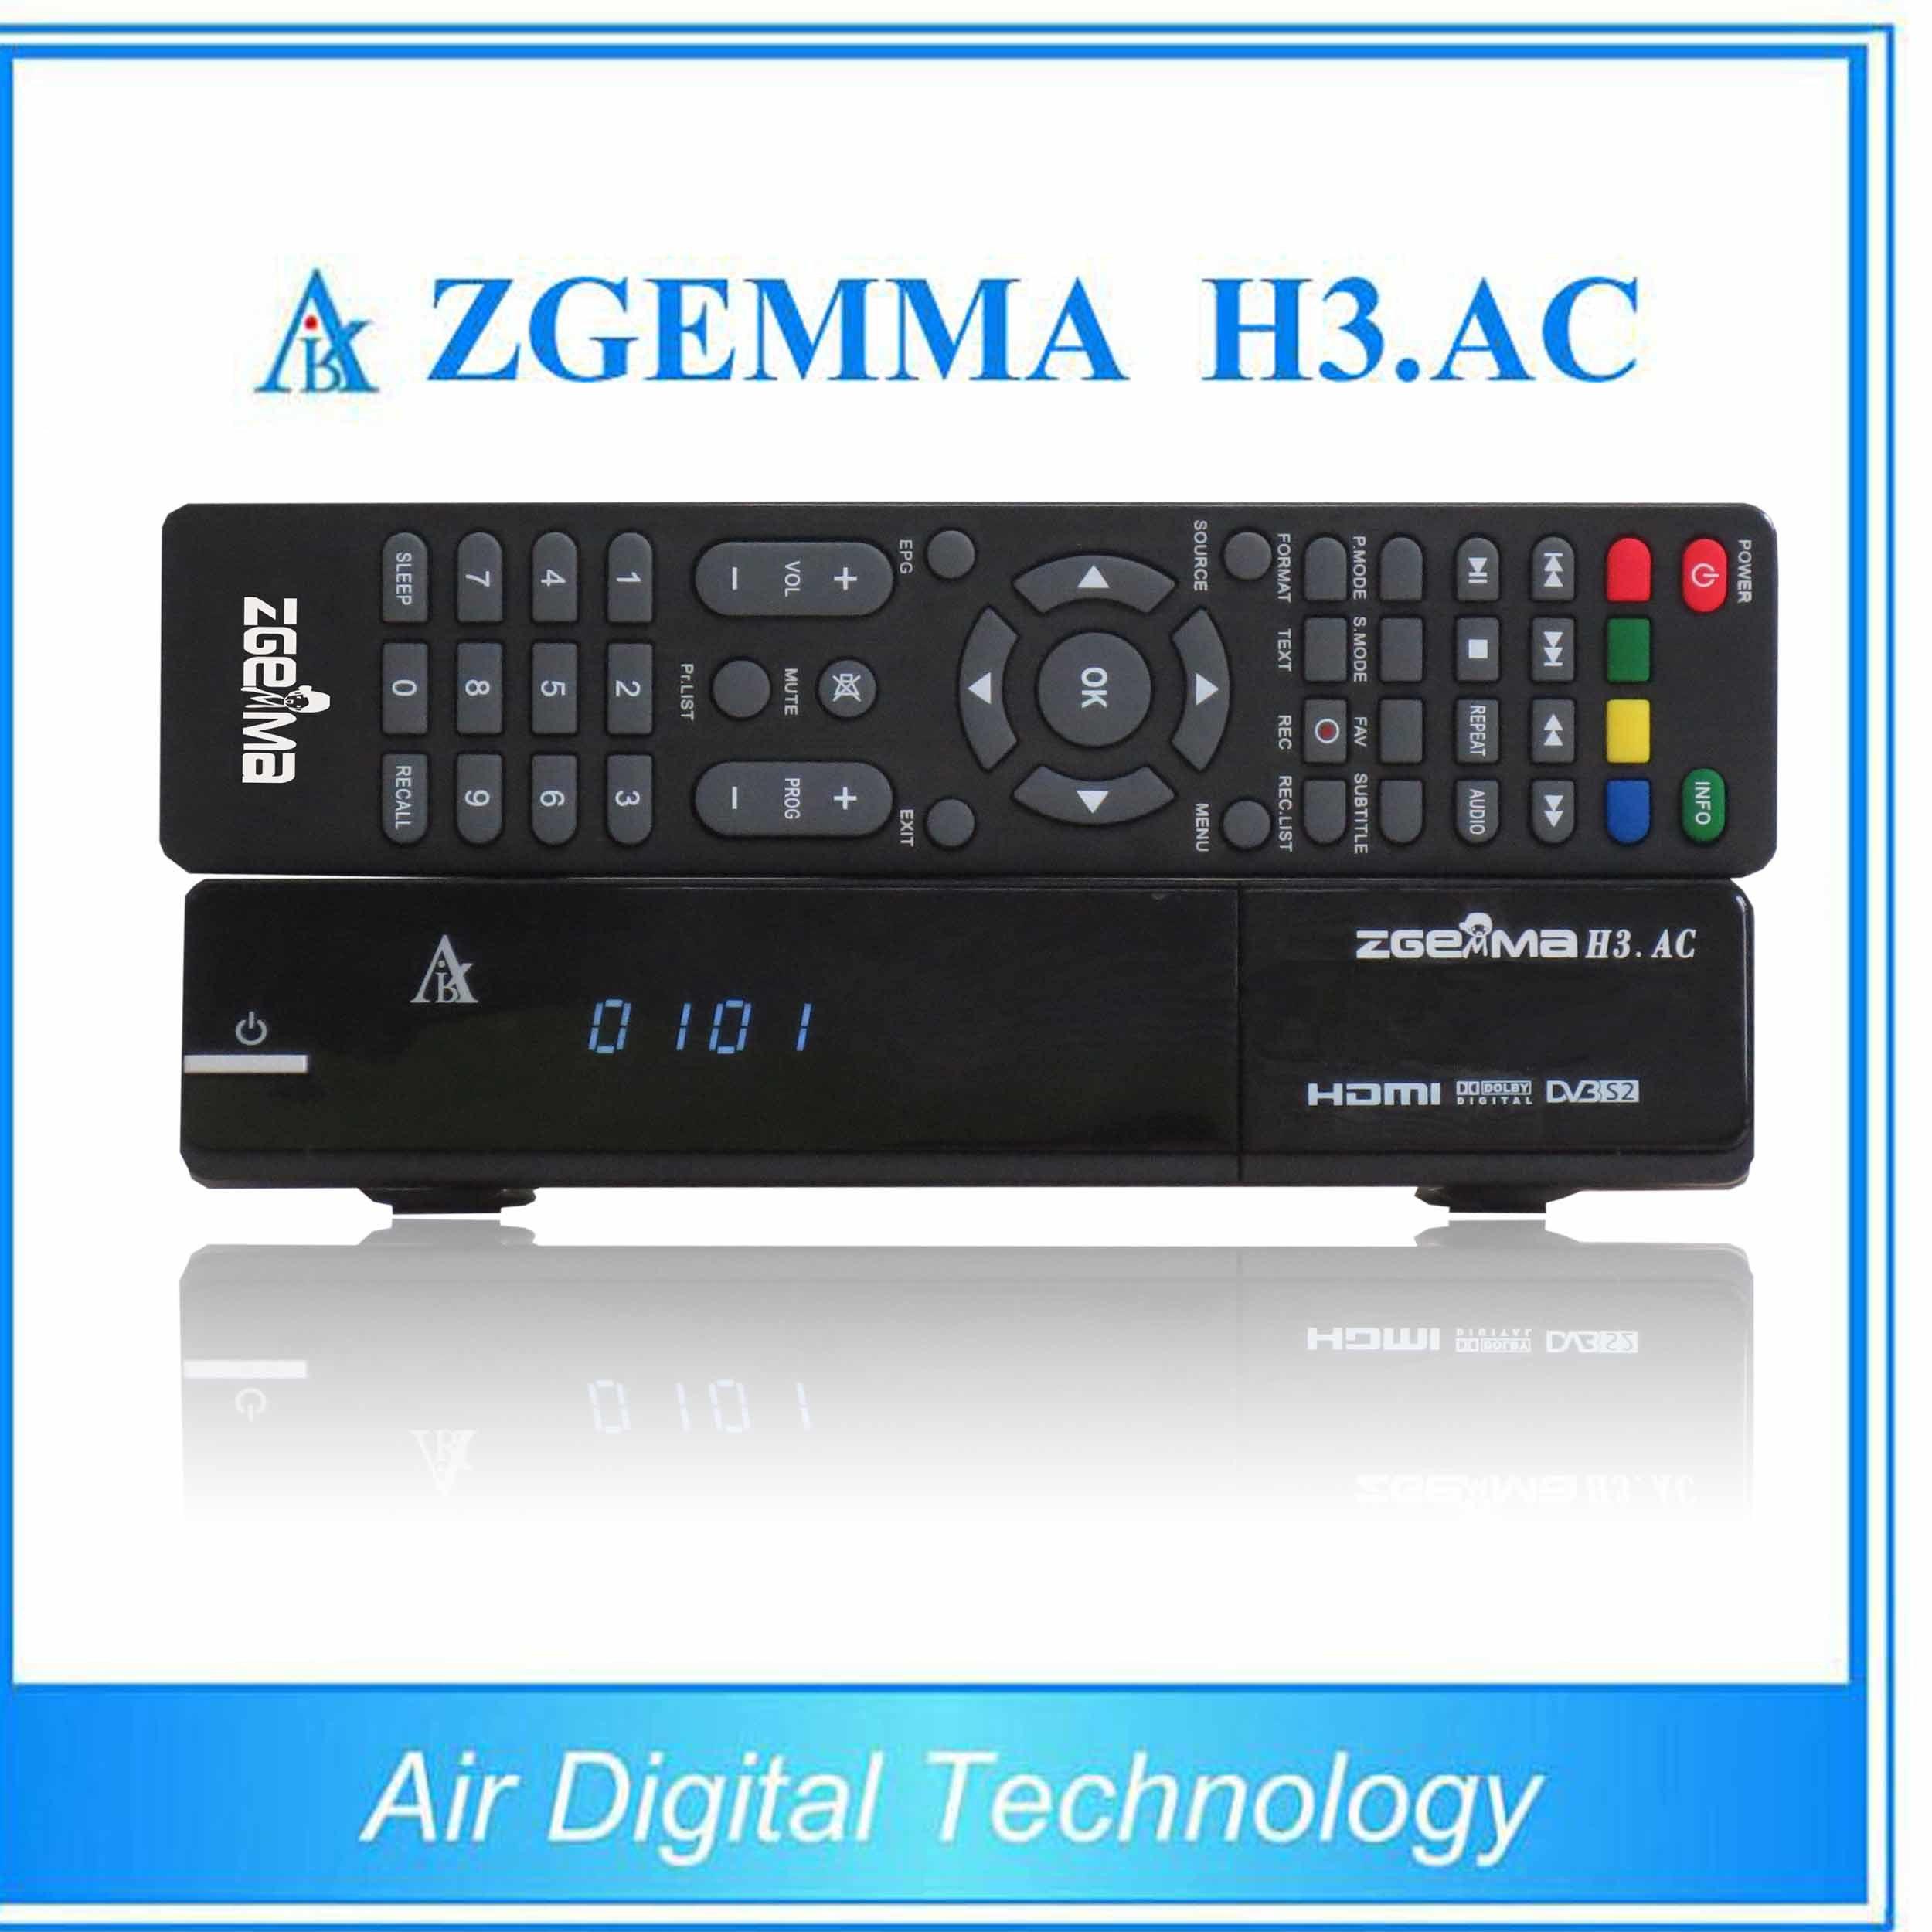 North America ATSC + Satellite Receiver DVB S/S2 Zgemma H3. AC